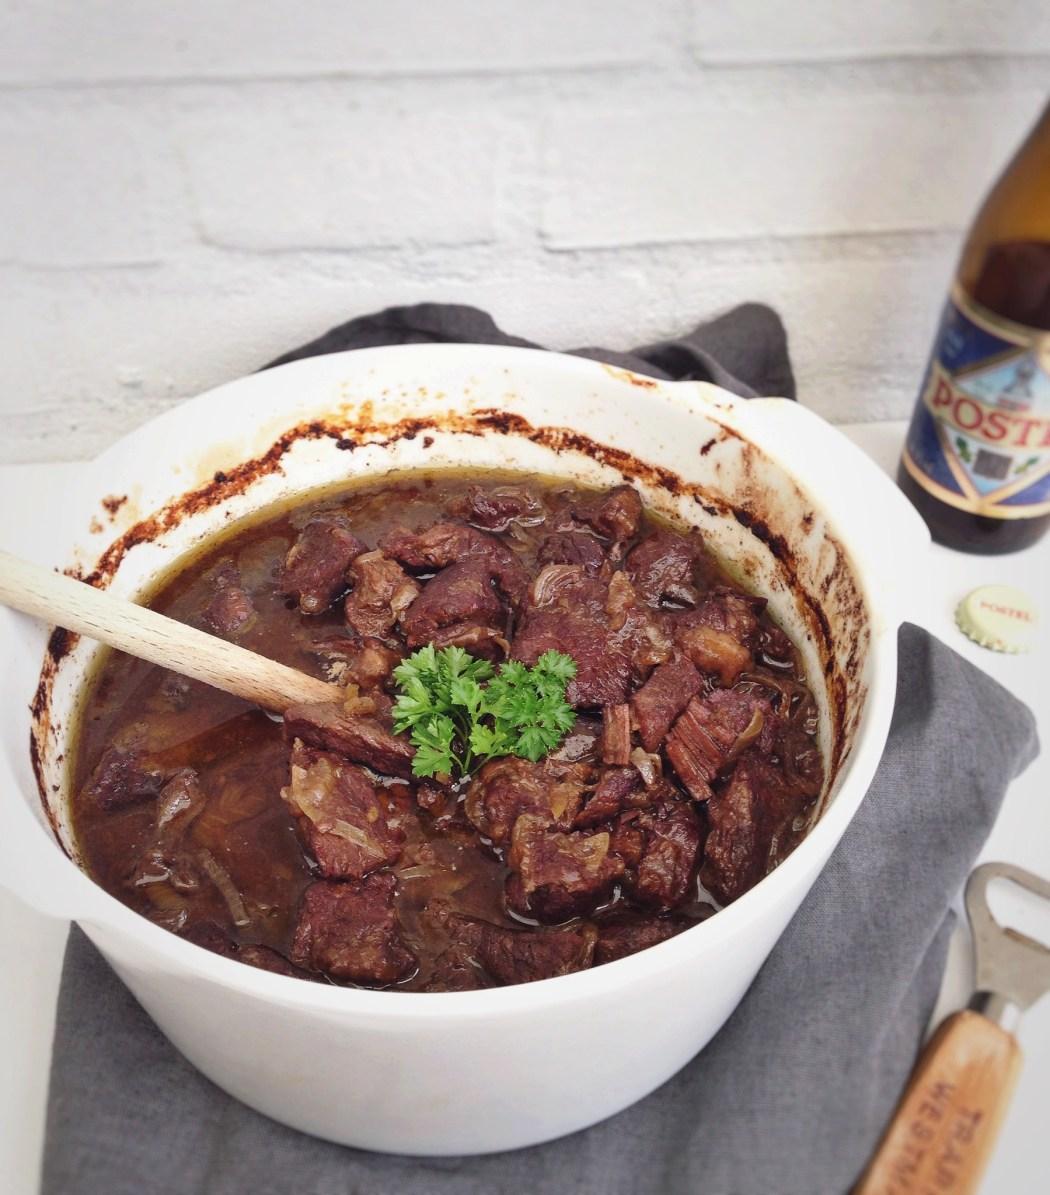 Stoofvlees met trappistenbier en specerijen, by Cookingdom